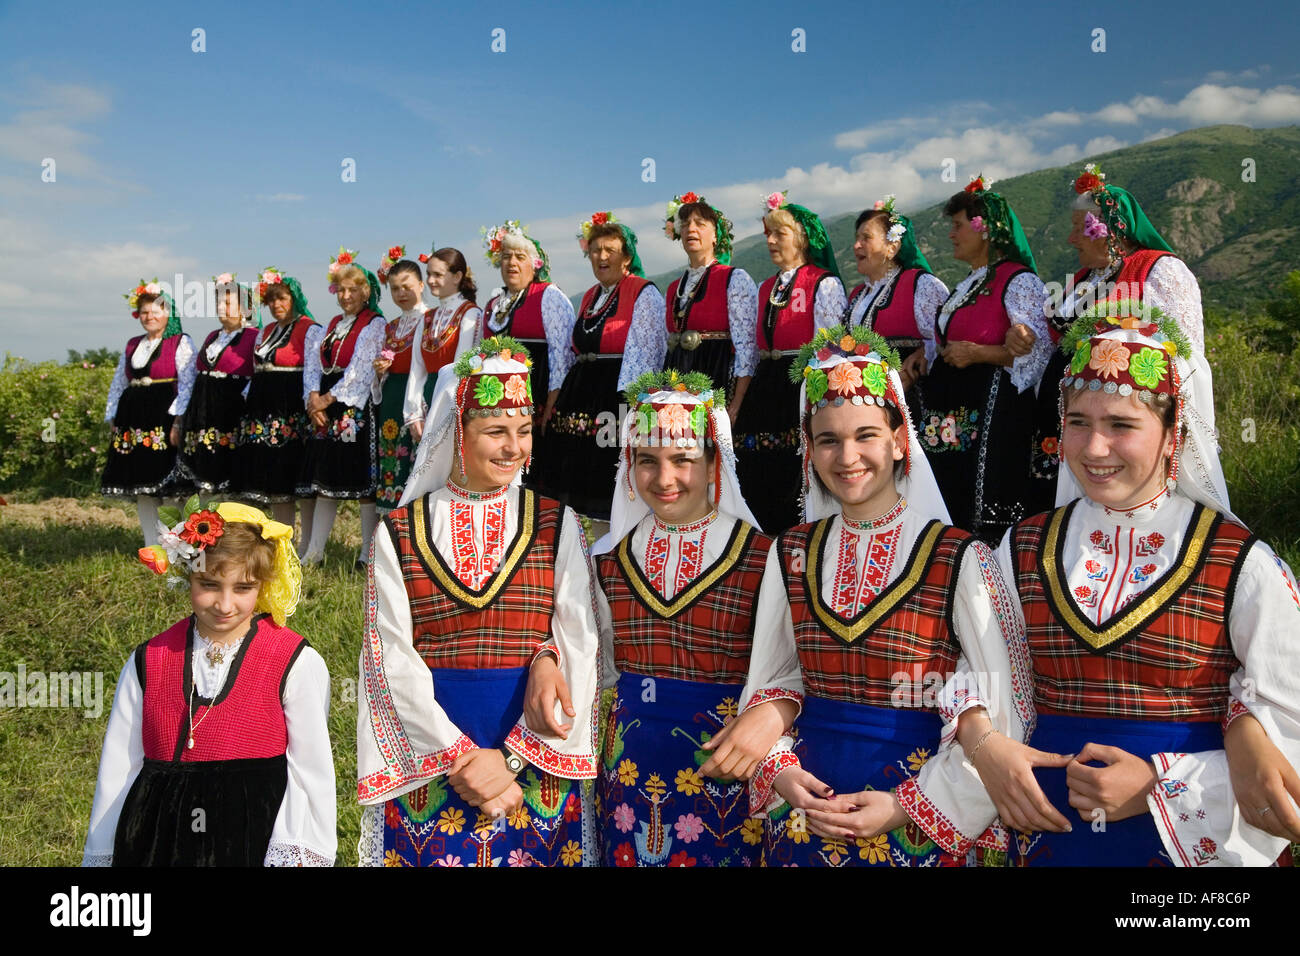 Grupo Folclórico, Rose Festival, Karlovo, Bulgaria Imagen De Stock